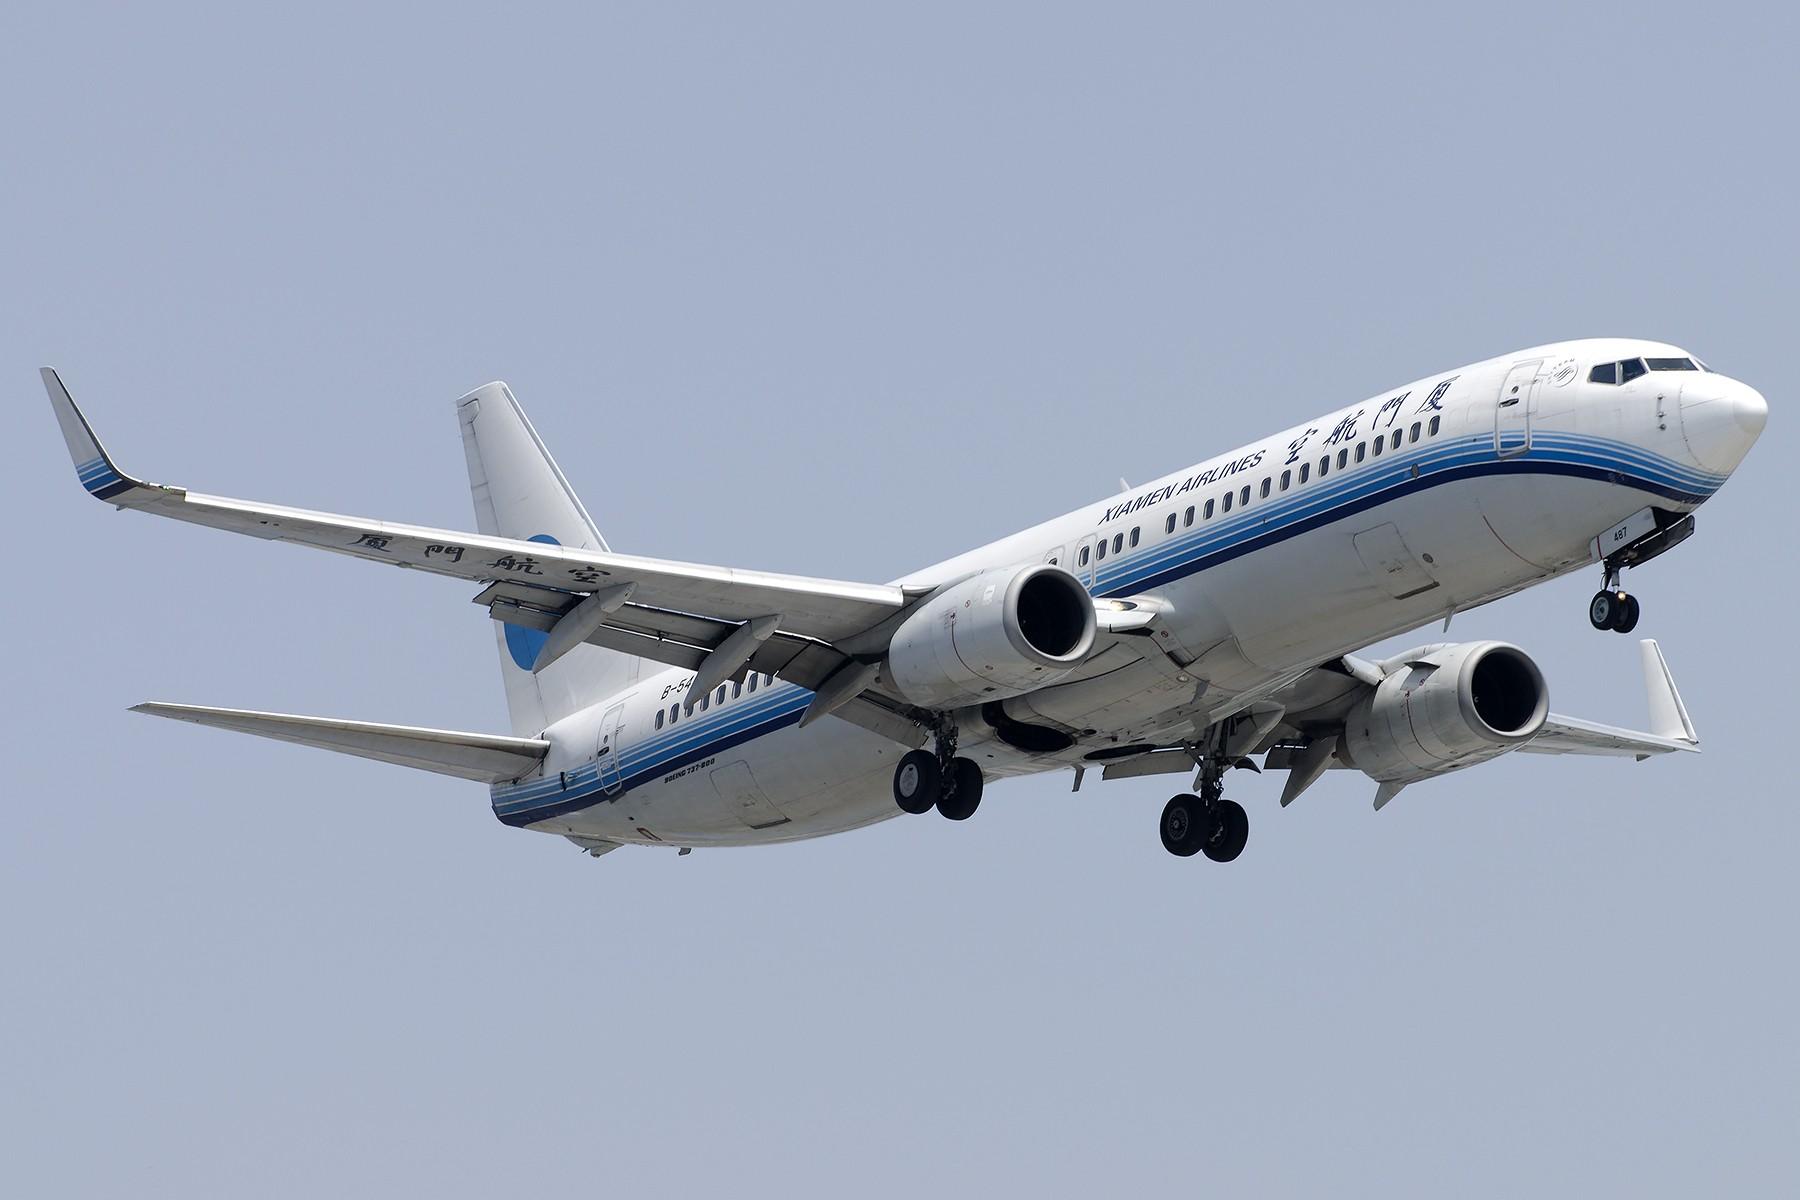 Re:[原创][原创]【SHA拍机*1800大图】4月拍的了,记得那天好货还挺多 BOEING 737-800 B-5487 中国上海虹桥国际机场